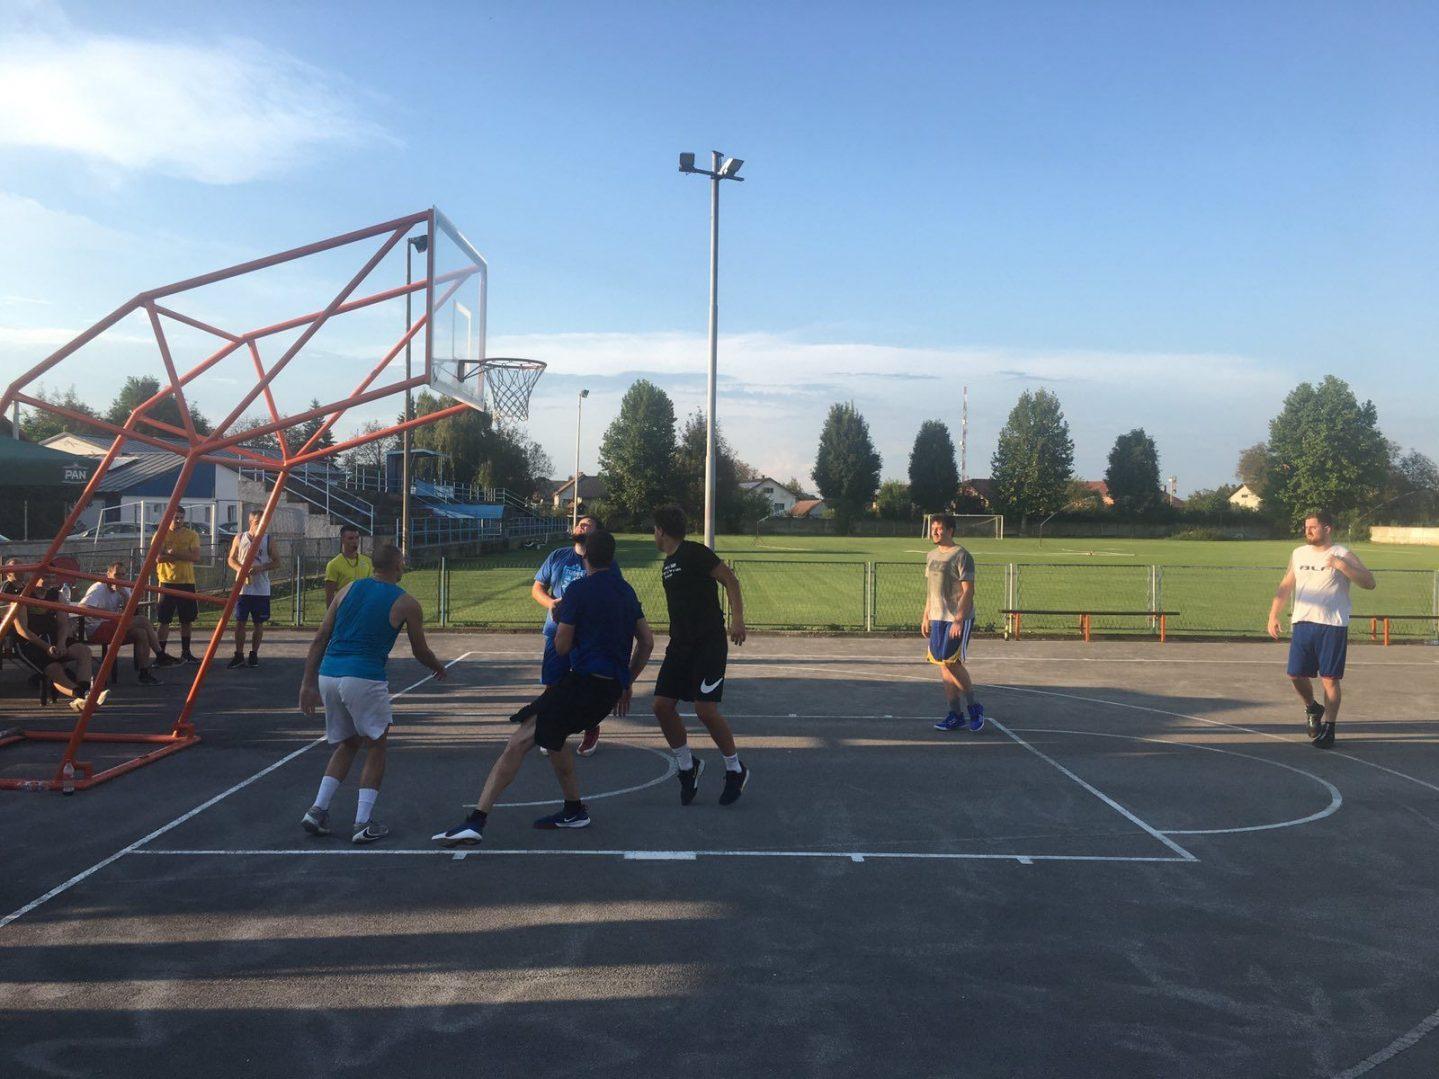 1. prvenstvo Međimurja u streetball-u 15